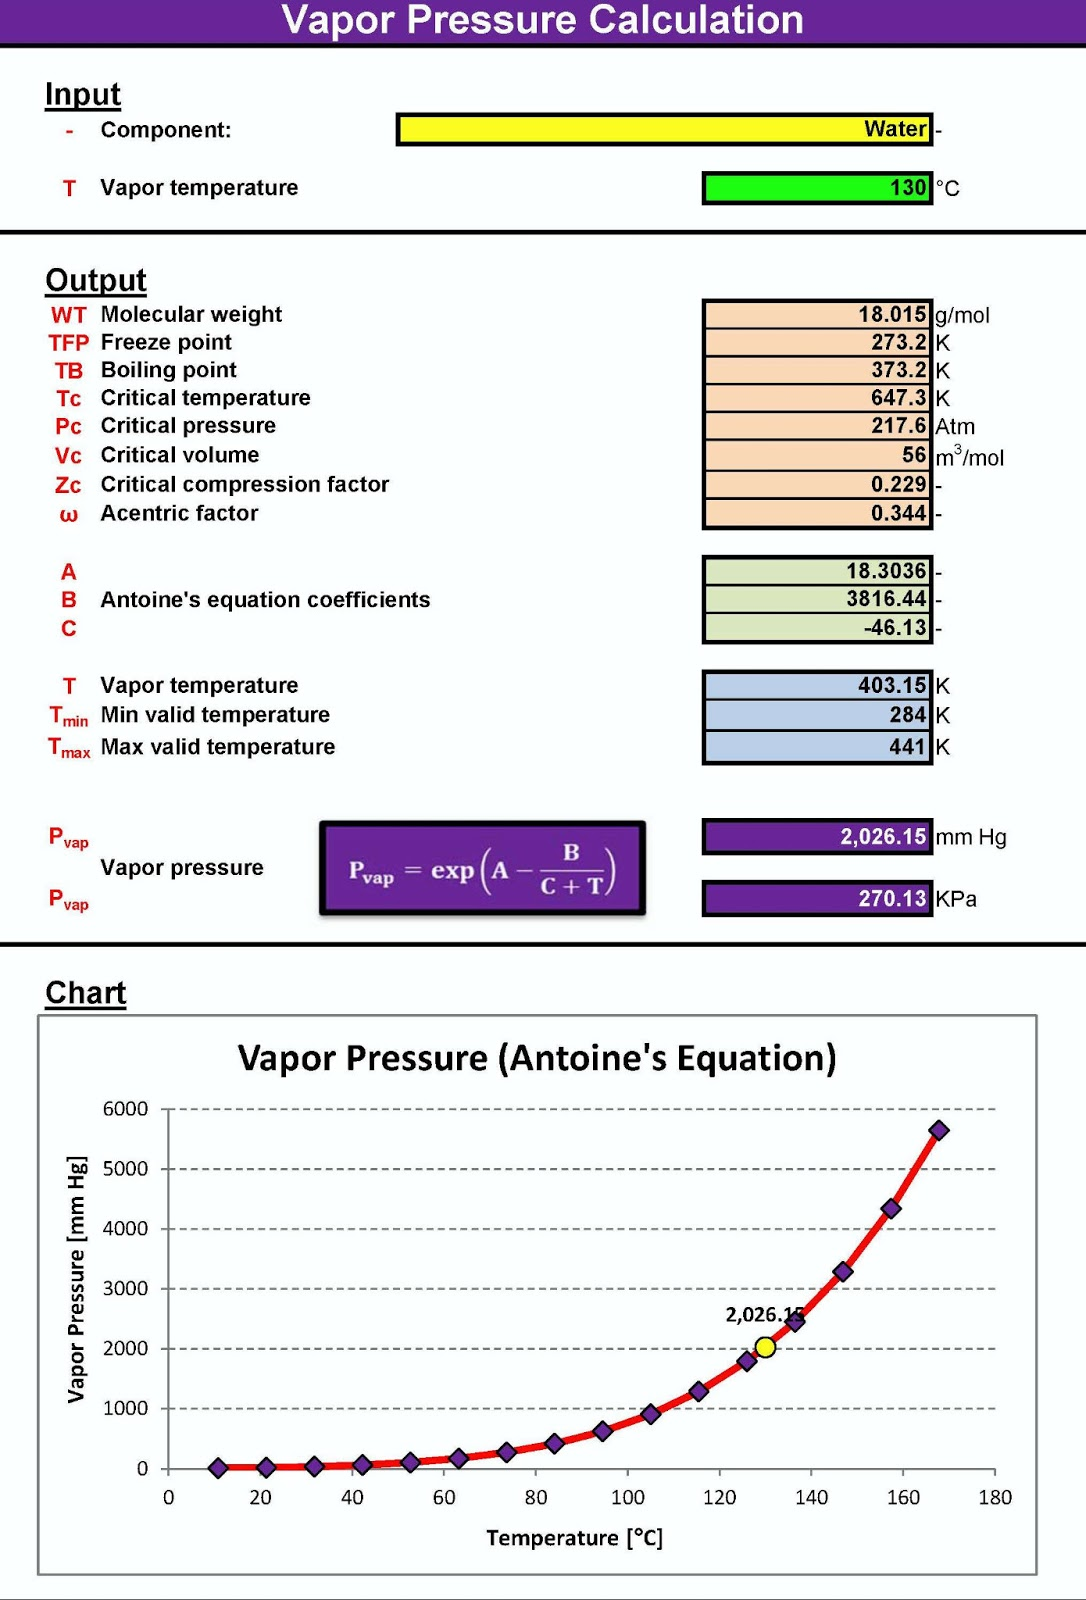 Vapor Pressure Calculation